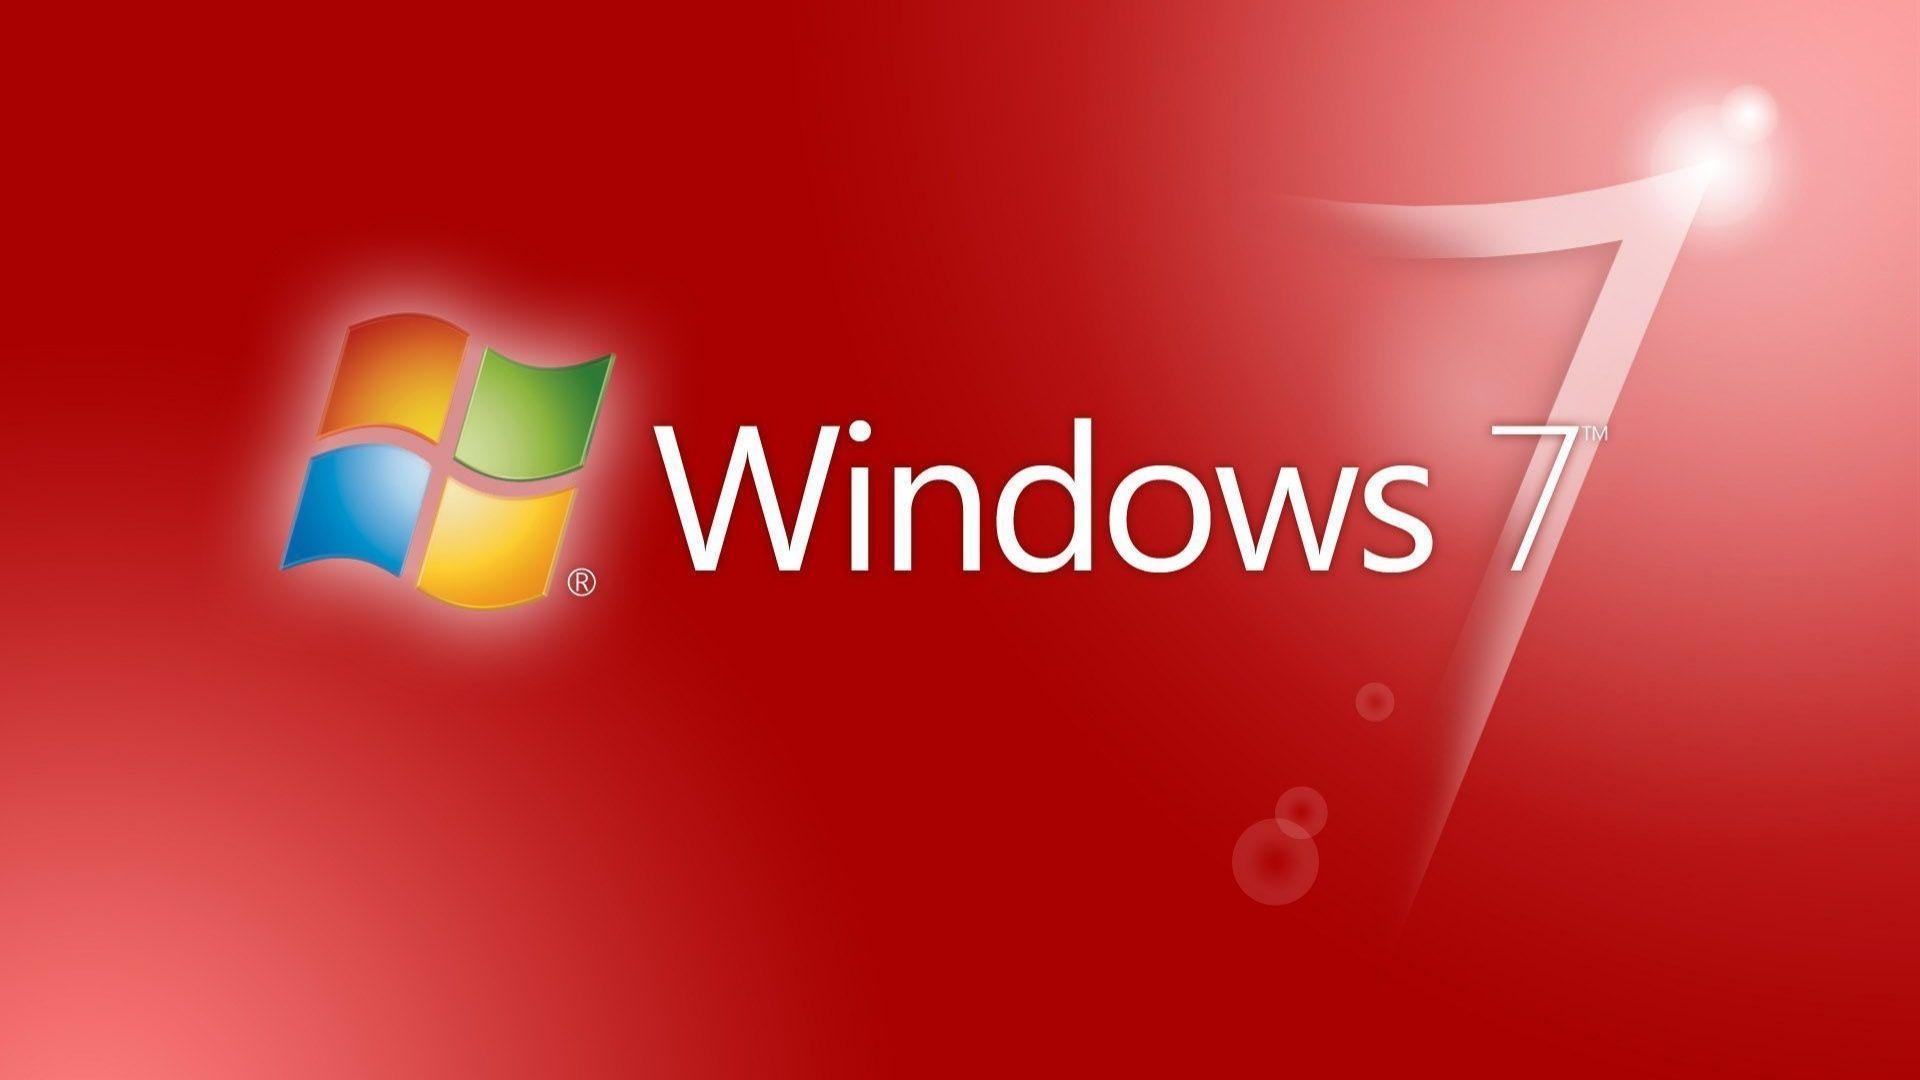 Most Inspiring Wallpaper High Quality Windows 7 - windows_7_hd_wallpapers_1080p_003  Pic_166367.jpg